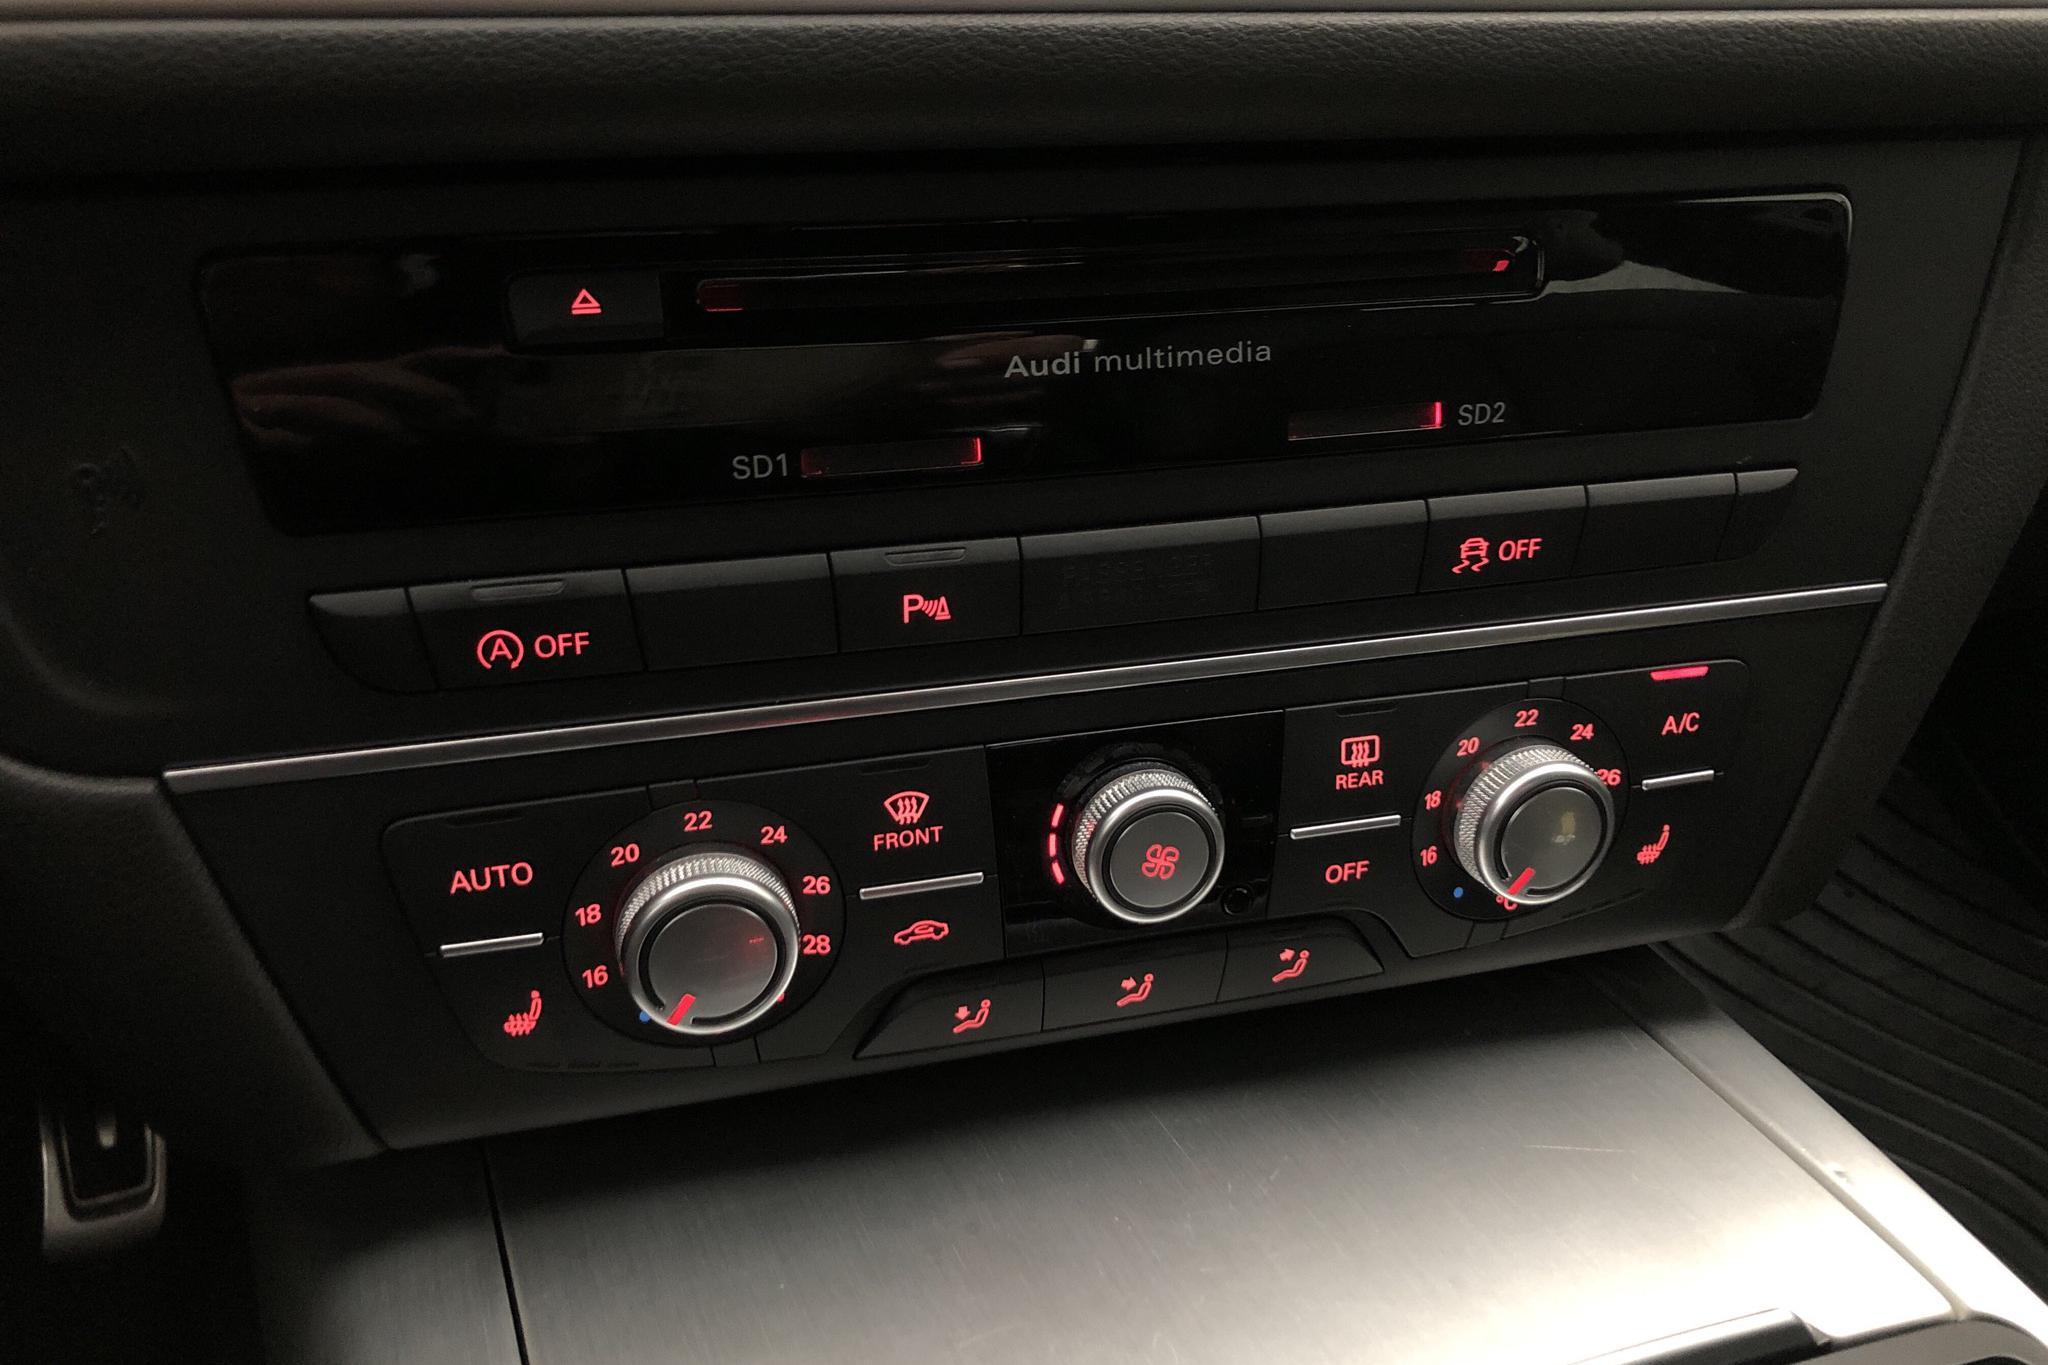 Audi A6 2.0 TDI Avant (190hk) - 127 690 km - Automatic - white - 2018